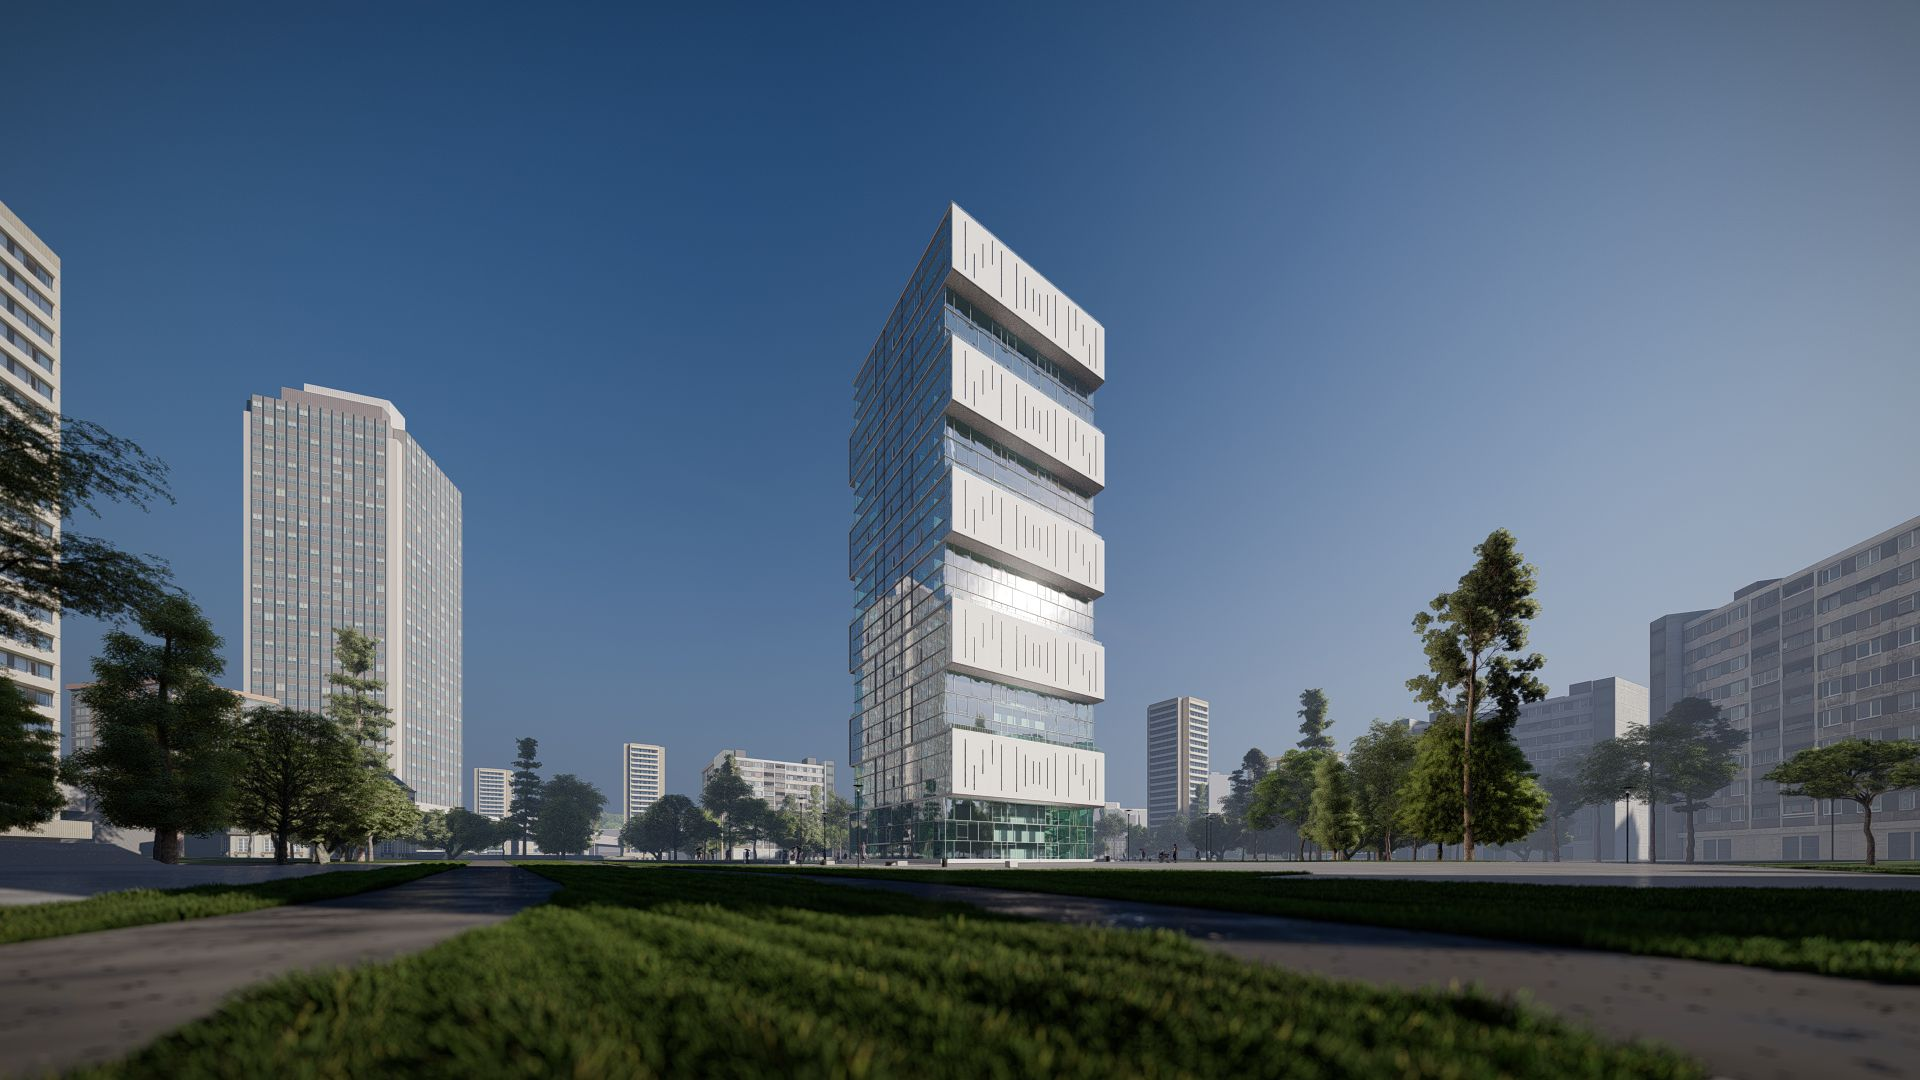 arhitektuurne 3d visualiseerimine pilve hoone 2 20